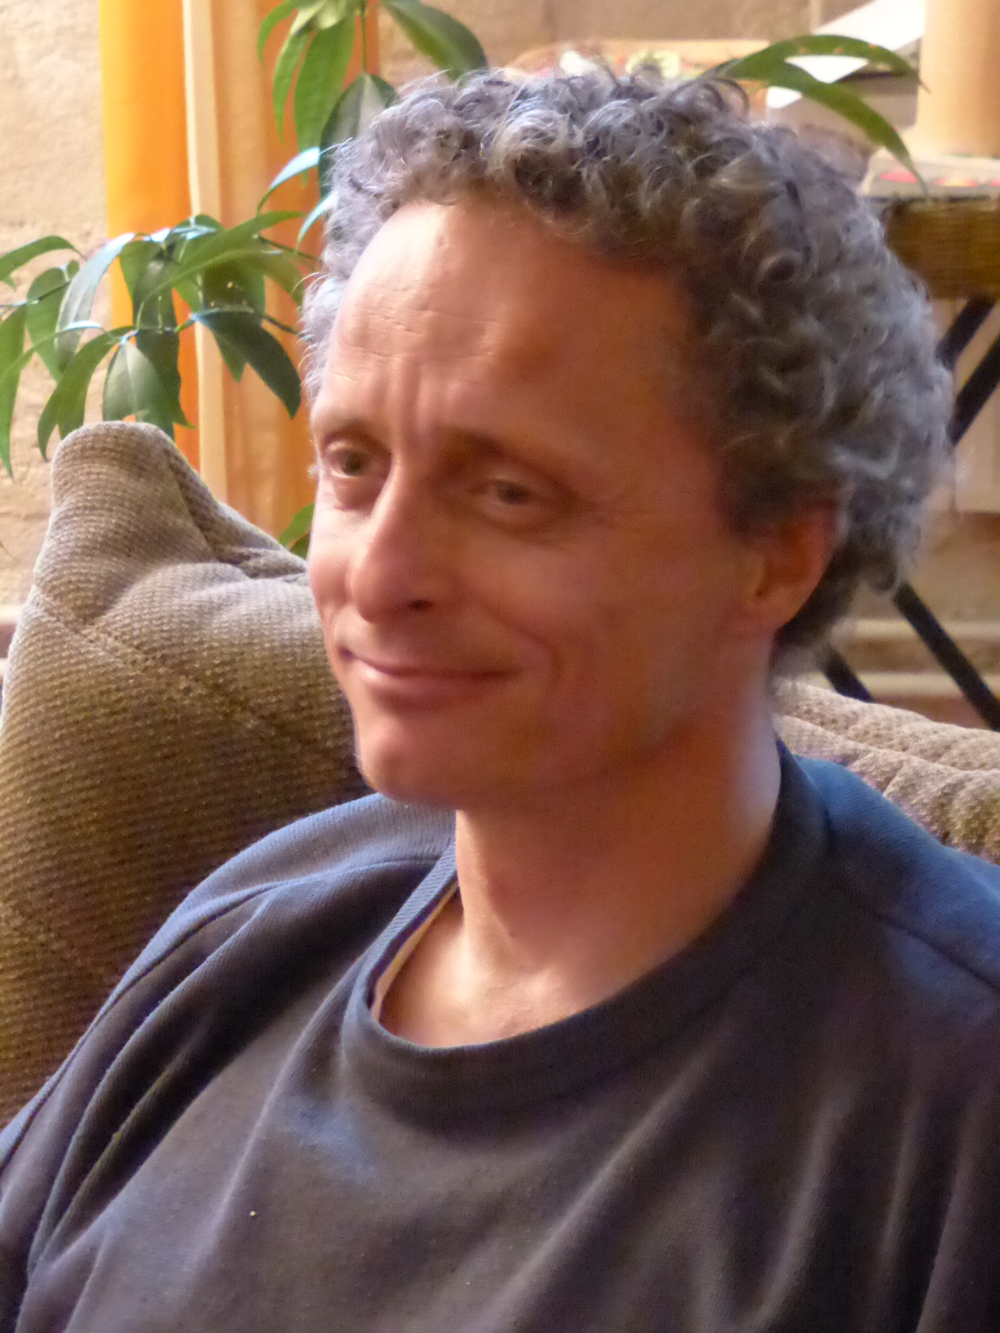 Jean-Luc Tendil